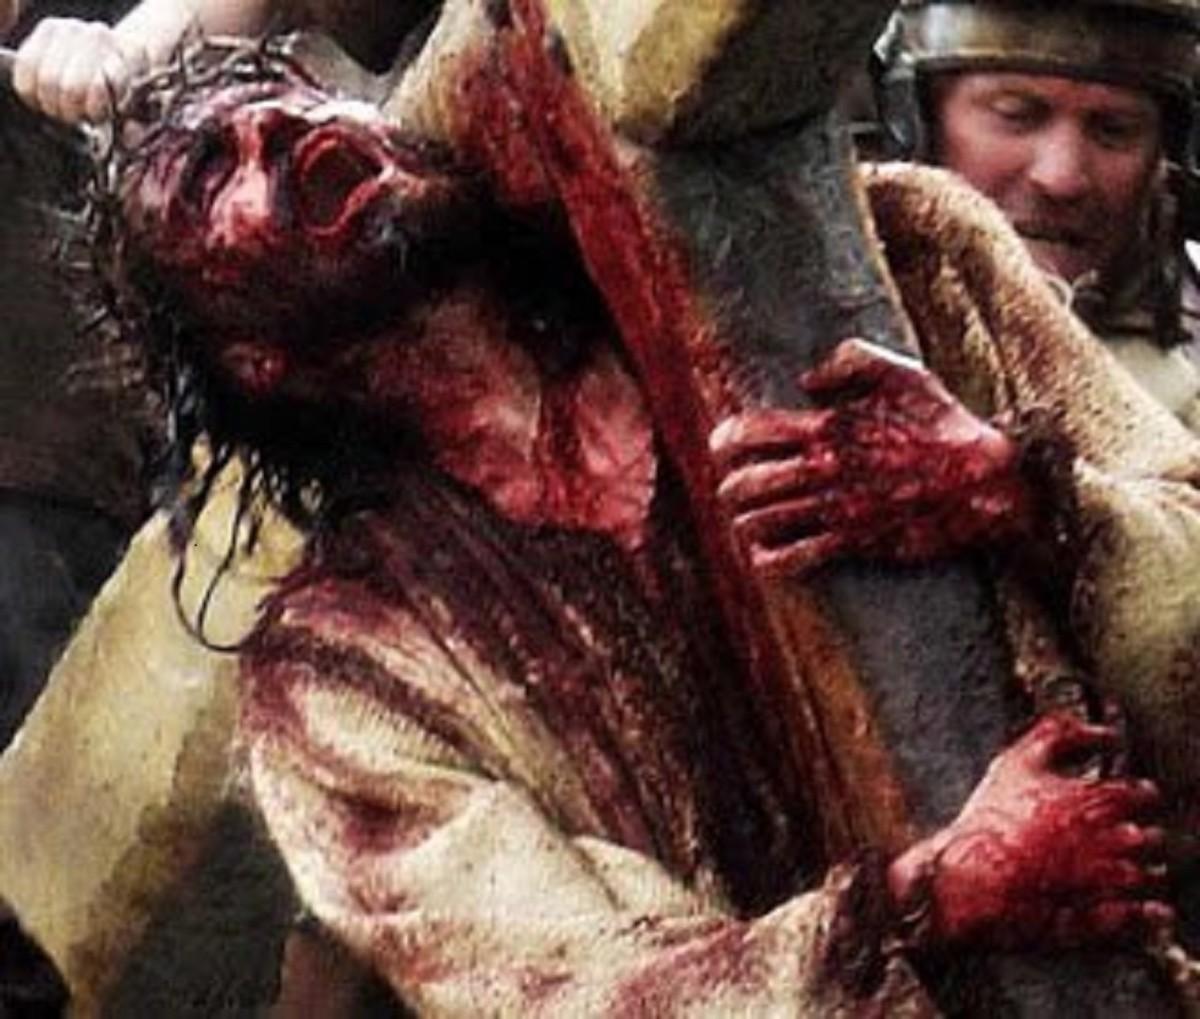 jesus-the-other-adam